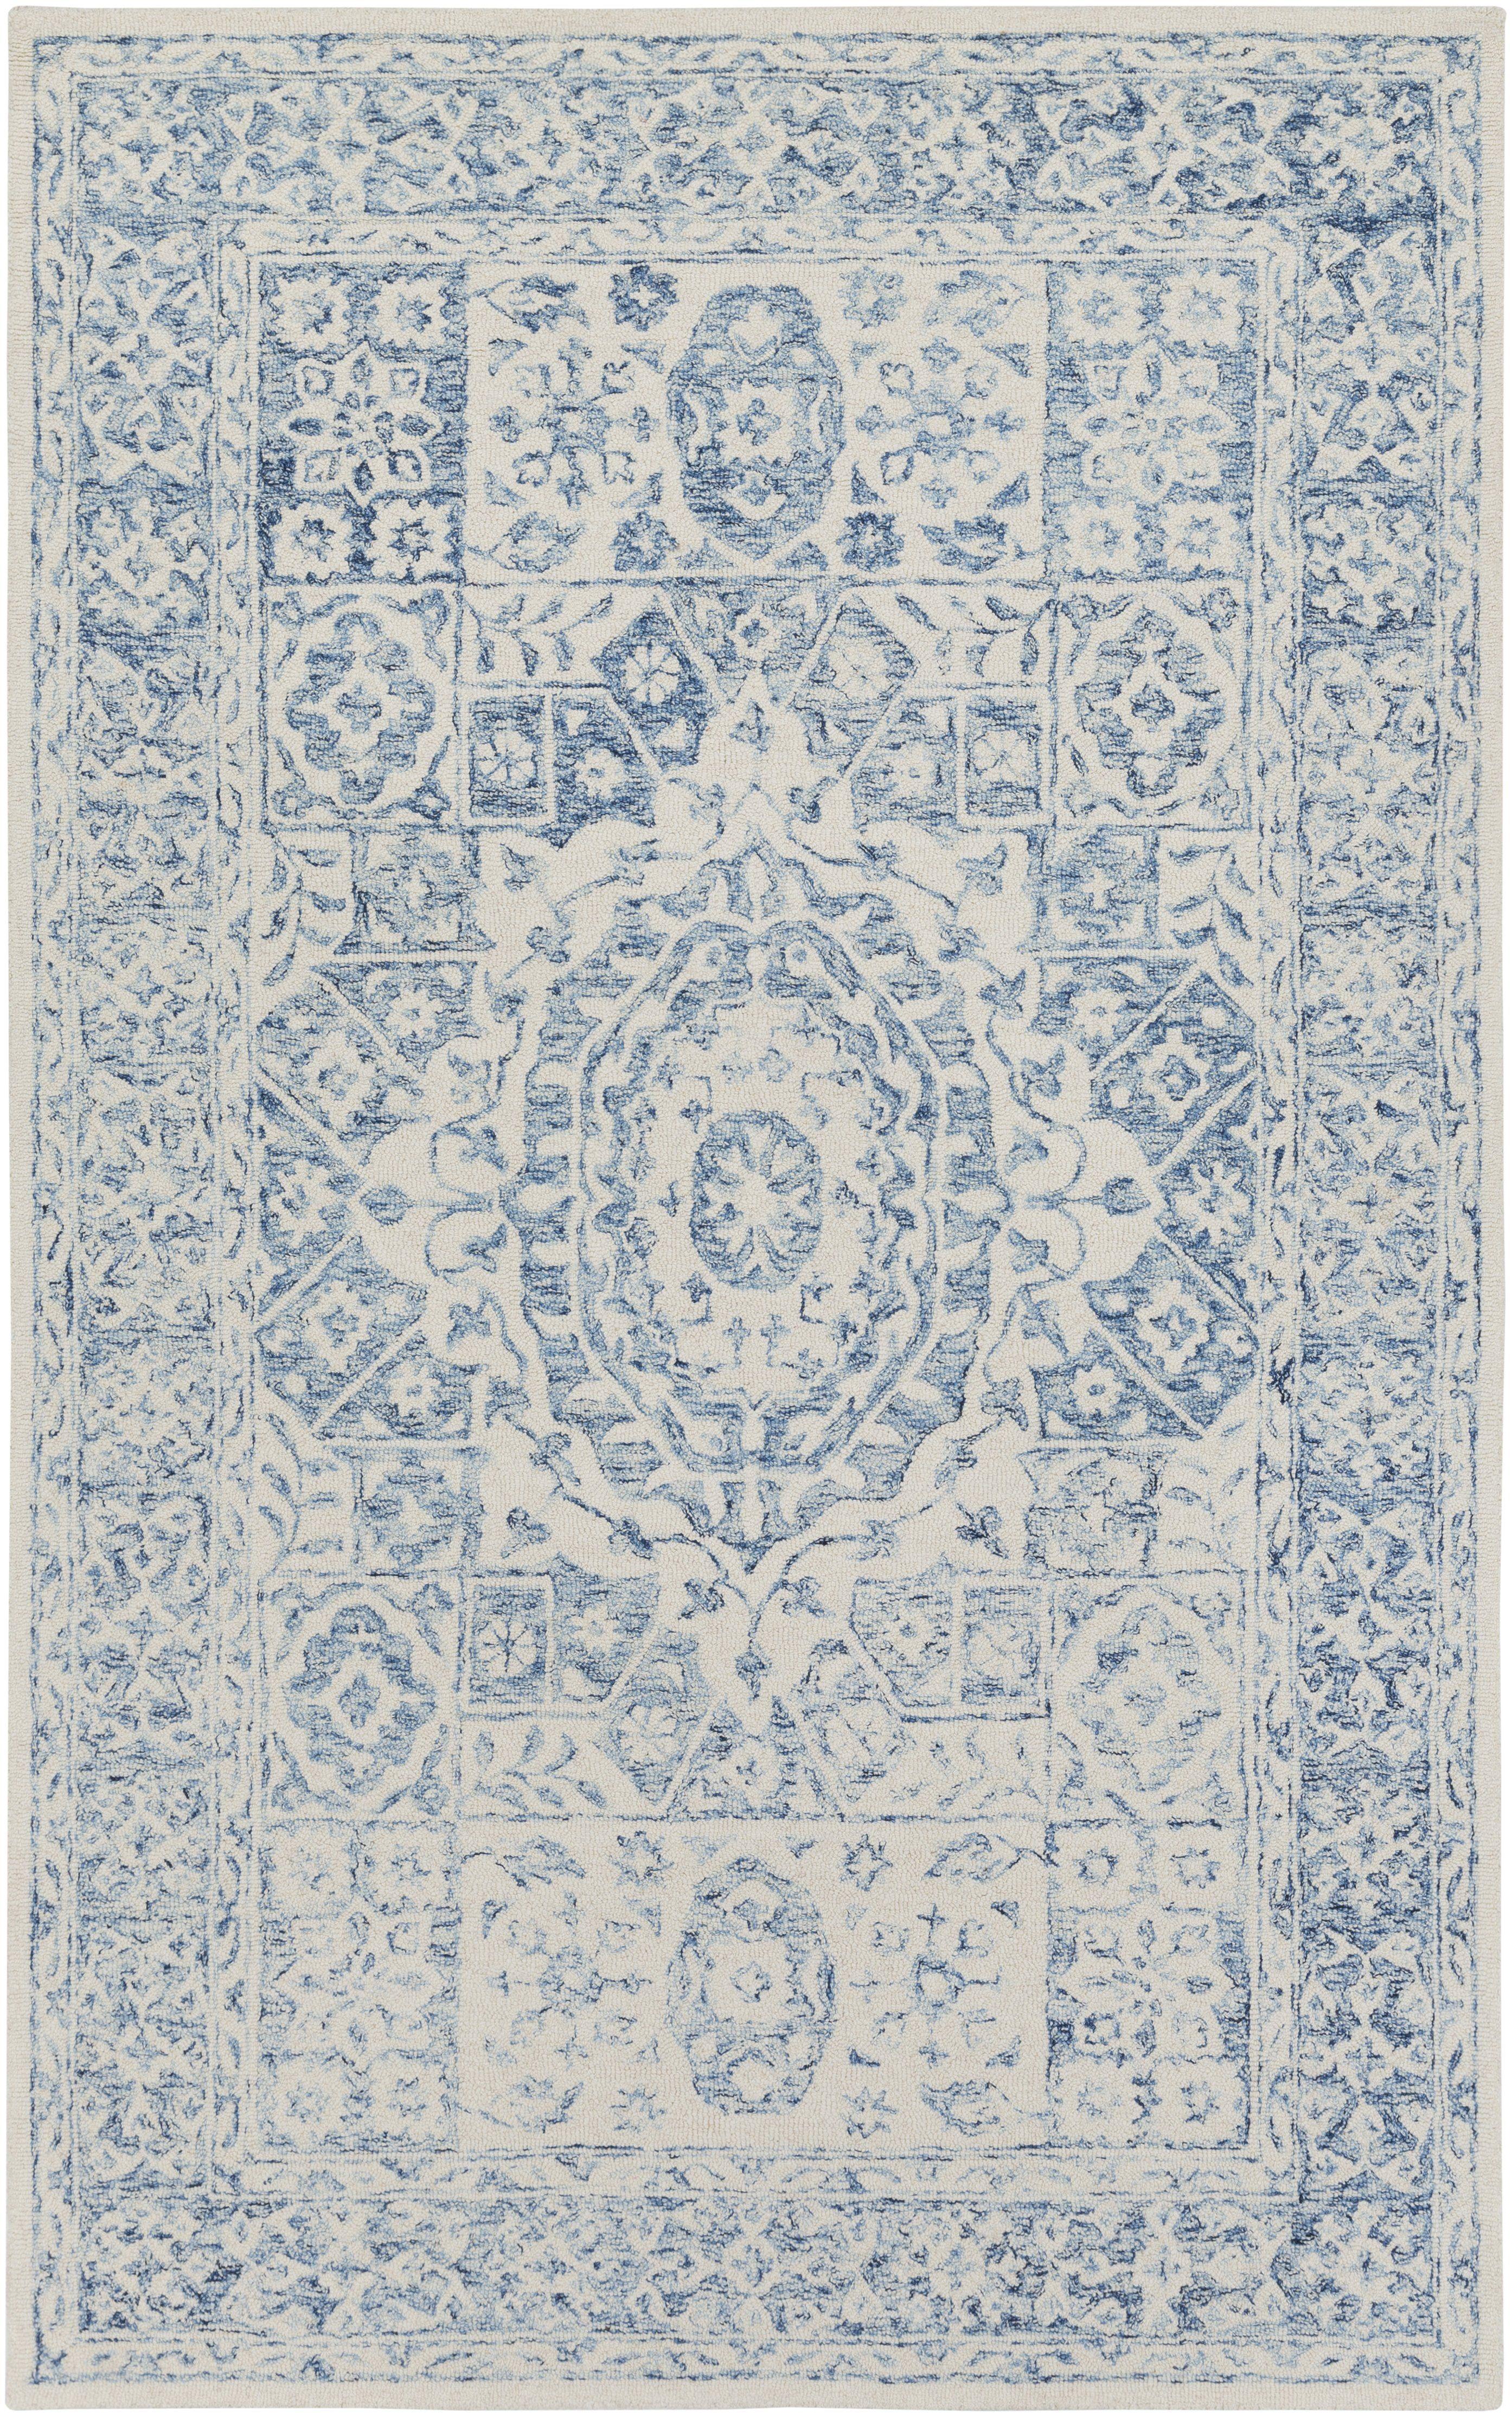 Surya serafina srf pale bluewhite area rug dream home decor